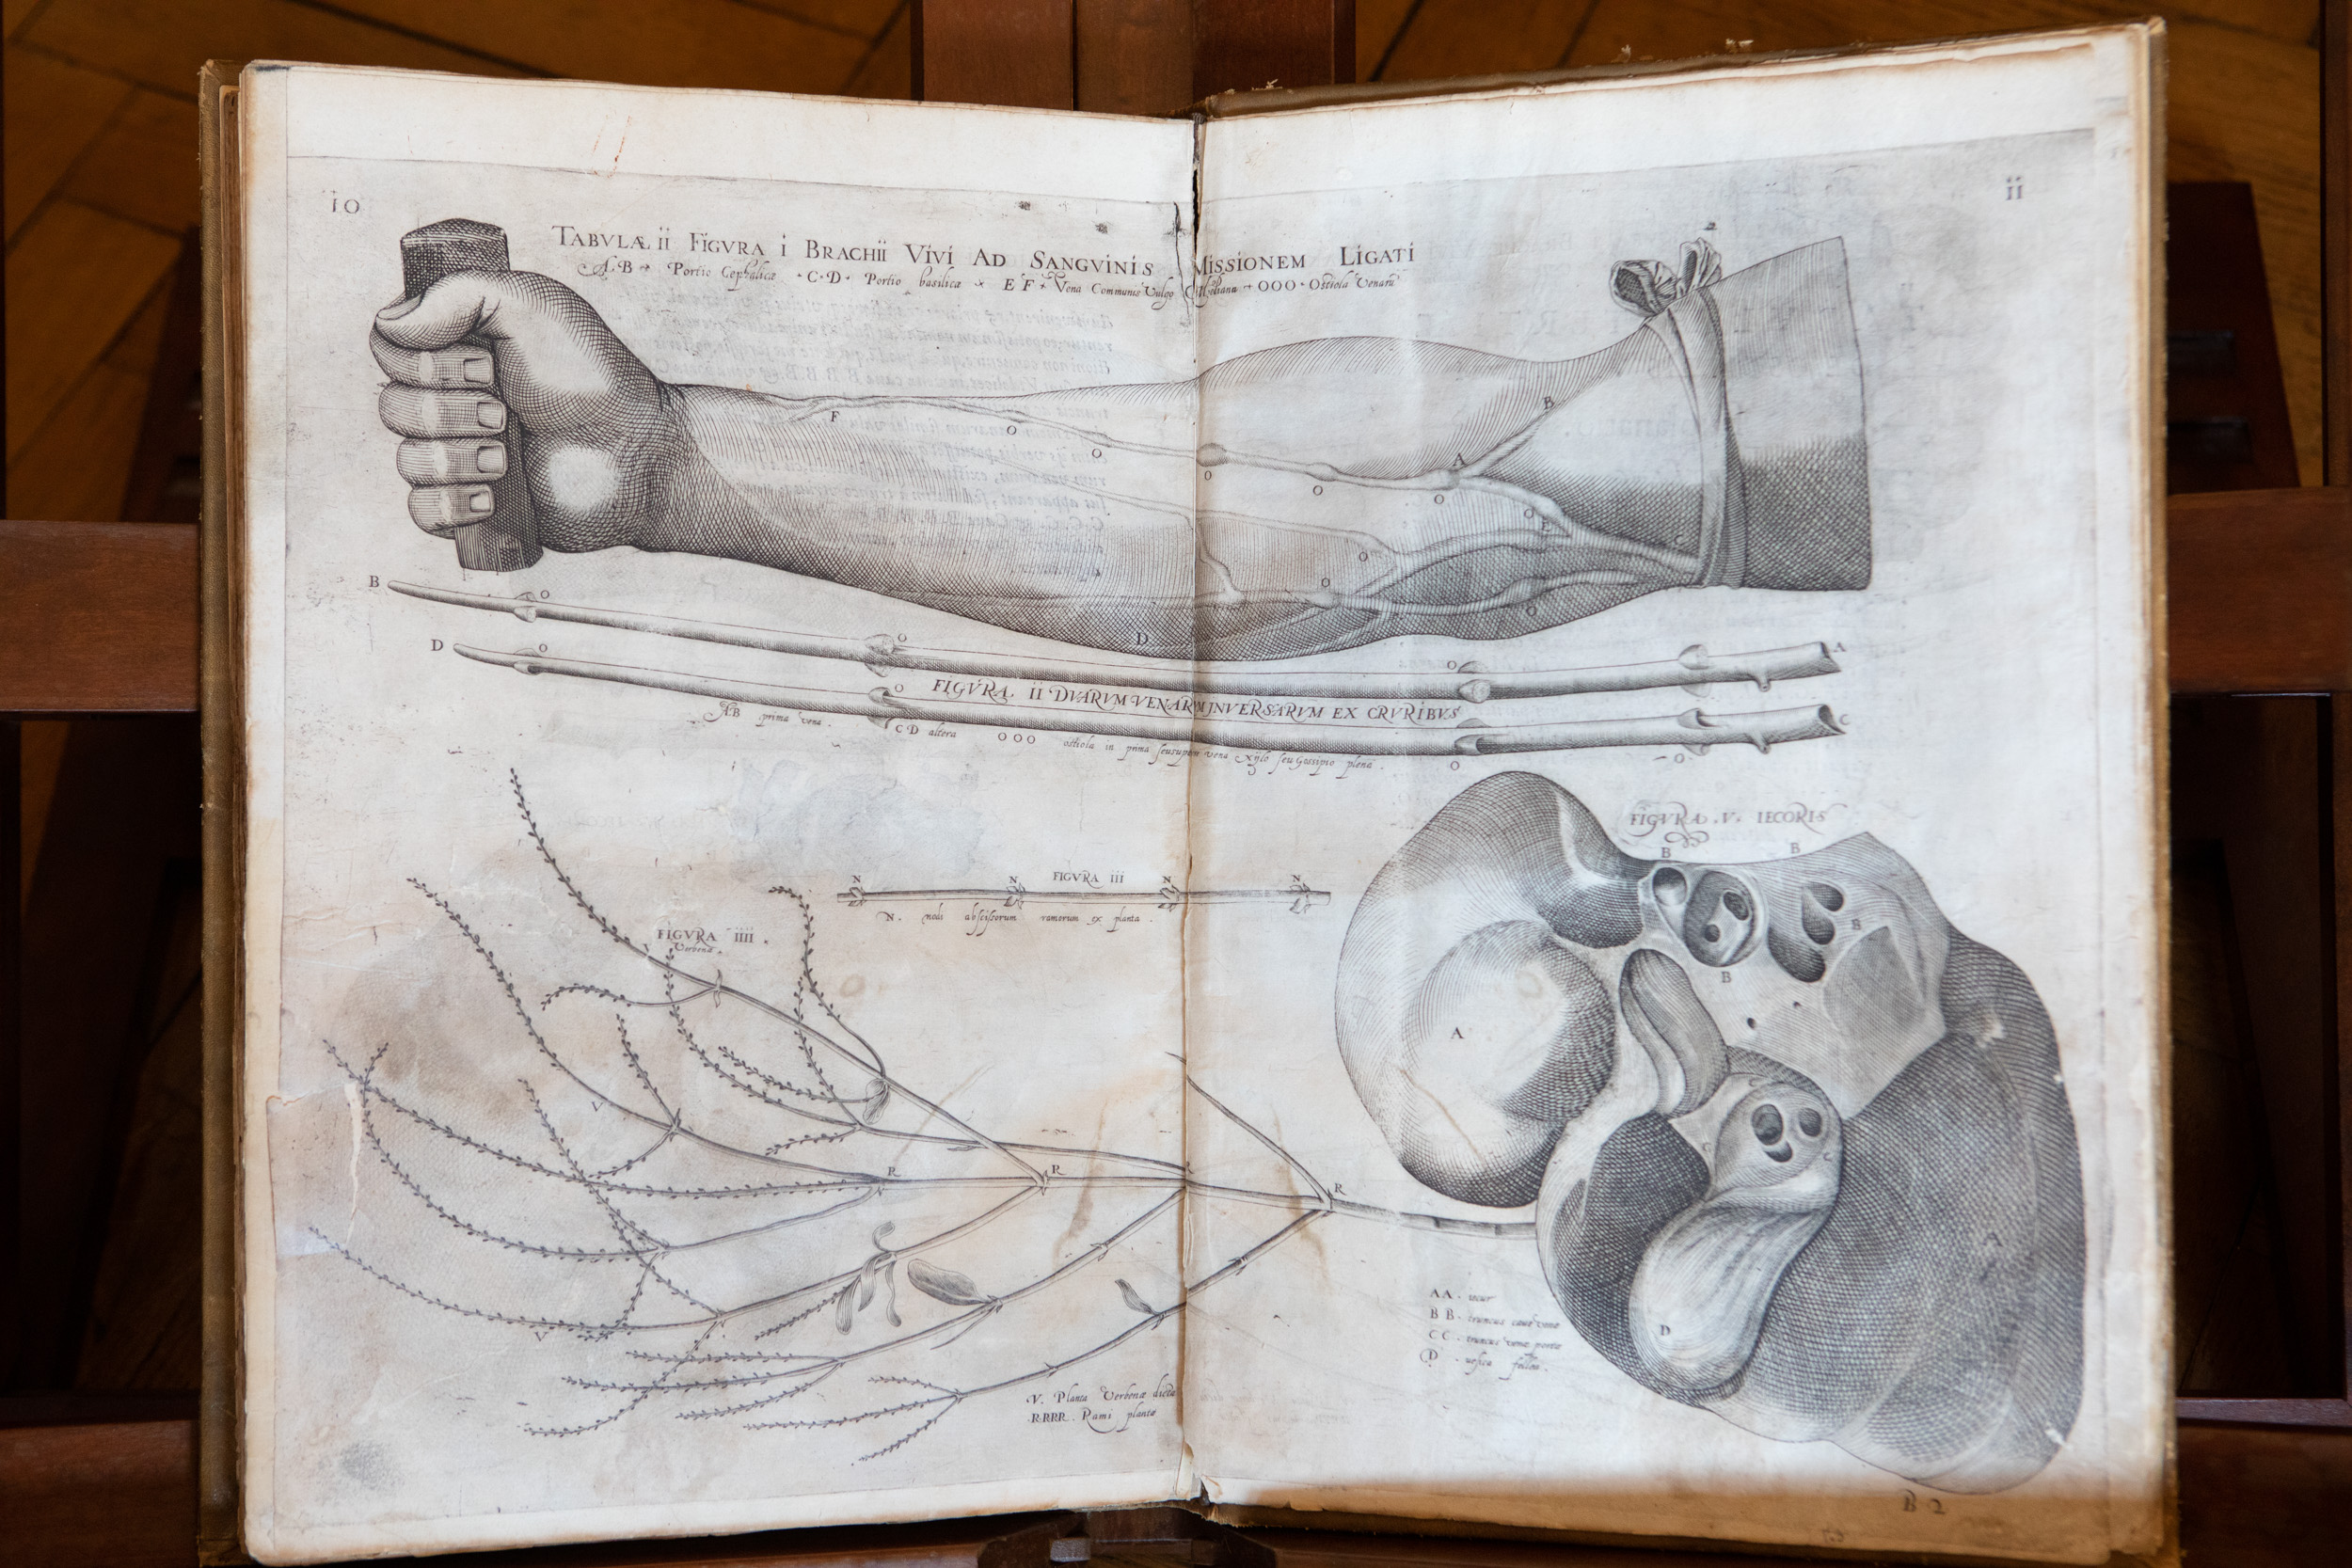 Medicina a Padova nei secoli: Fabrici d'Acquapendente, quando l'anatomia incontra l'arte 360a1870